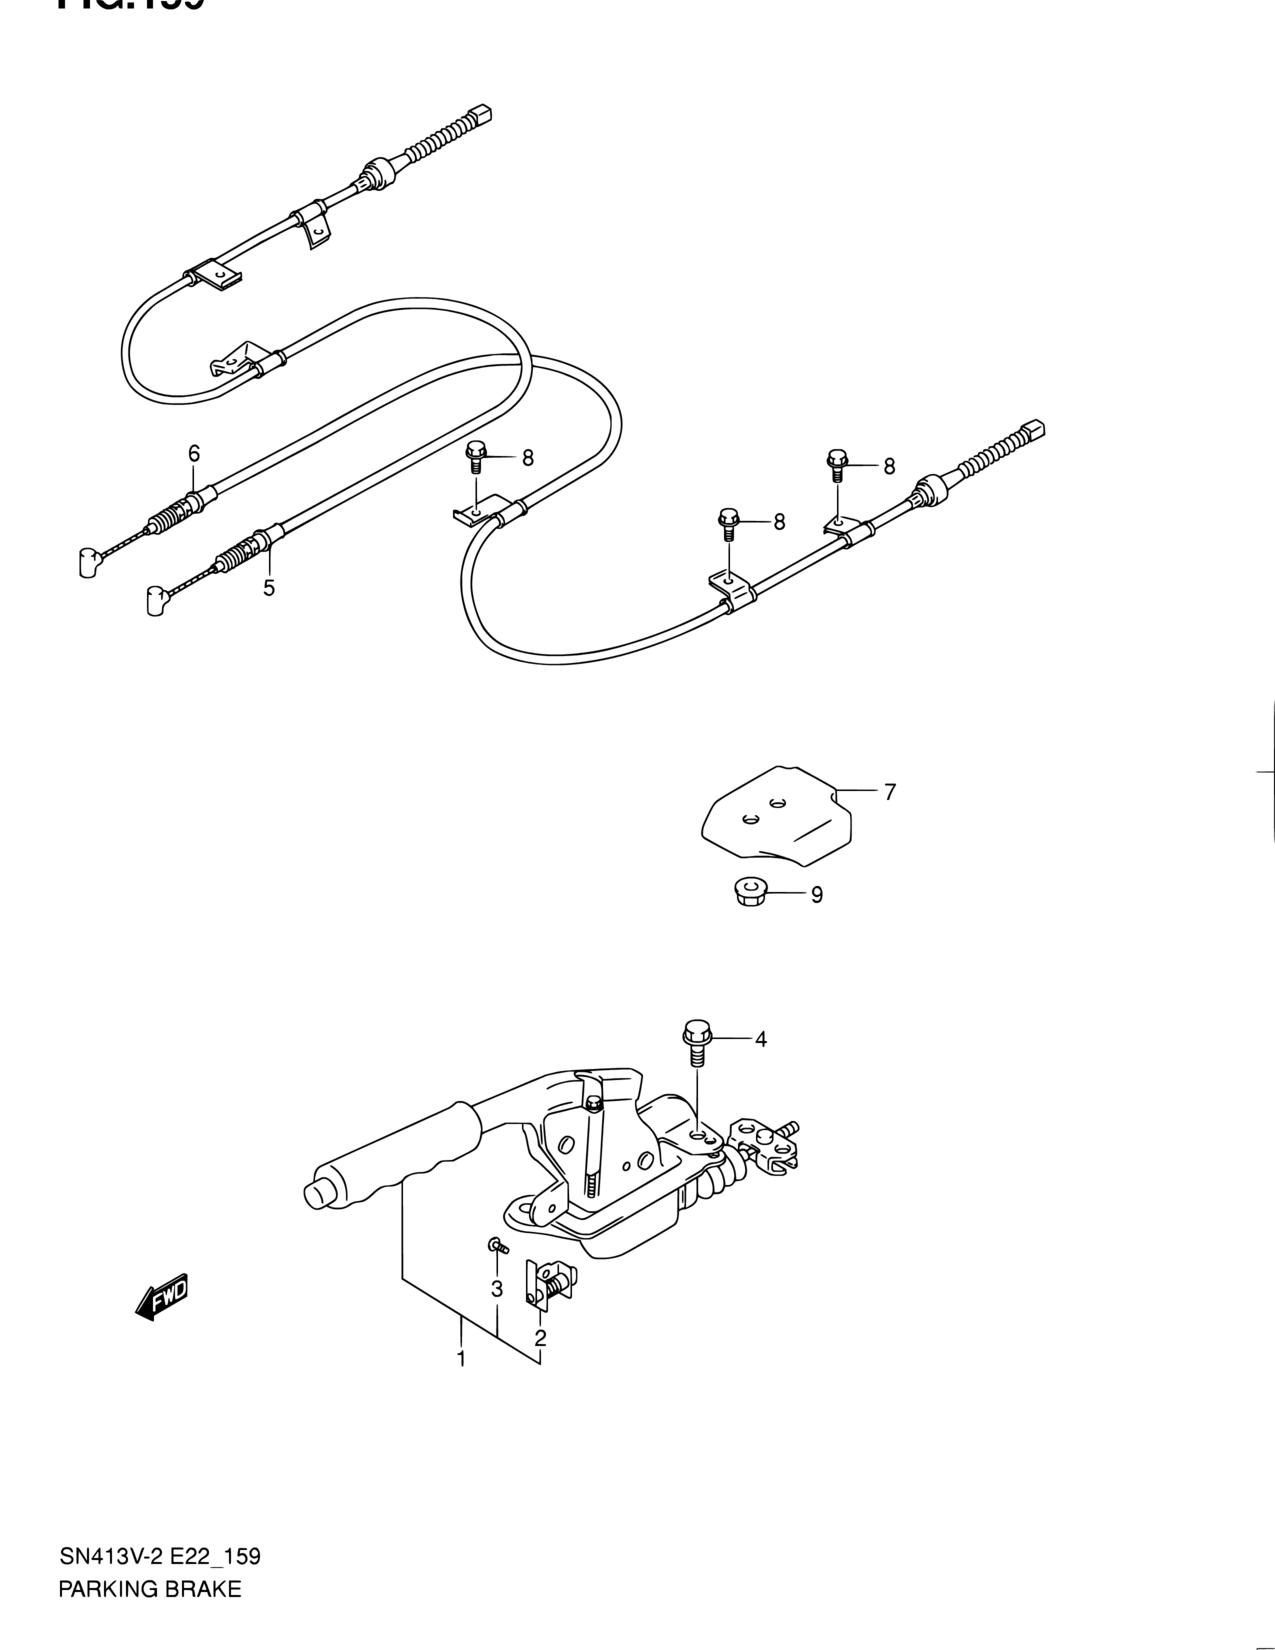 Gh 0820 Oil Level Sensor Wiring Diagram Likewise 1984 Bmw 318i Wiring Diagrams Download Diagram